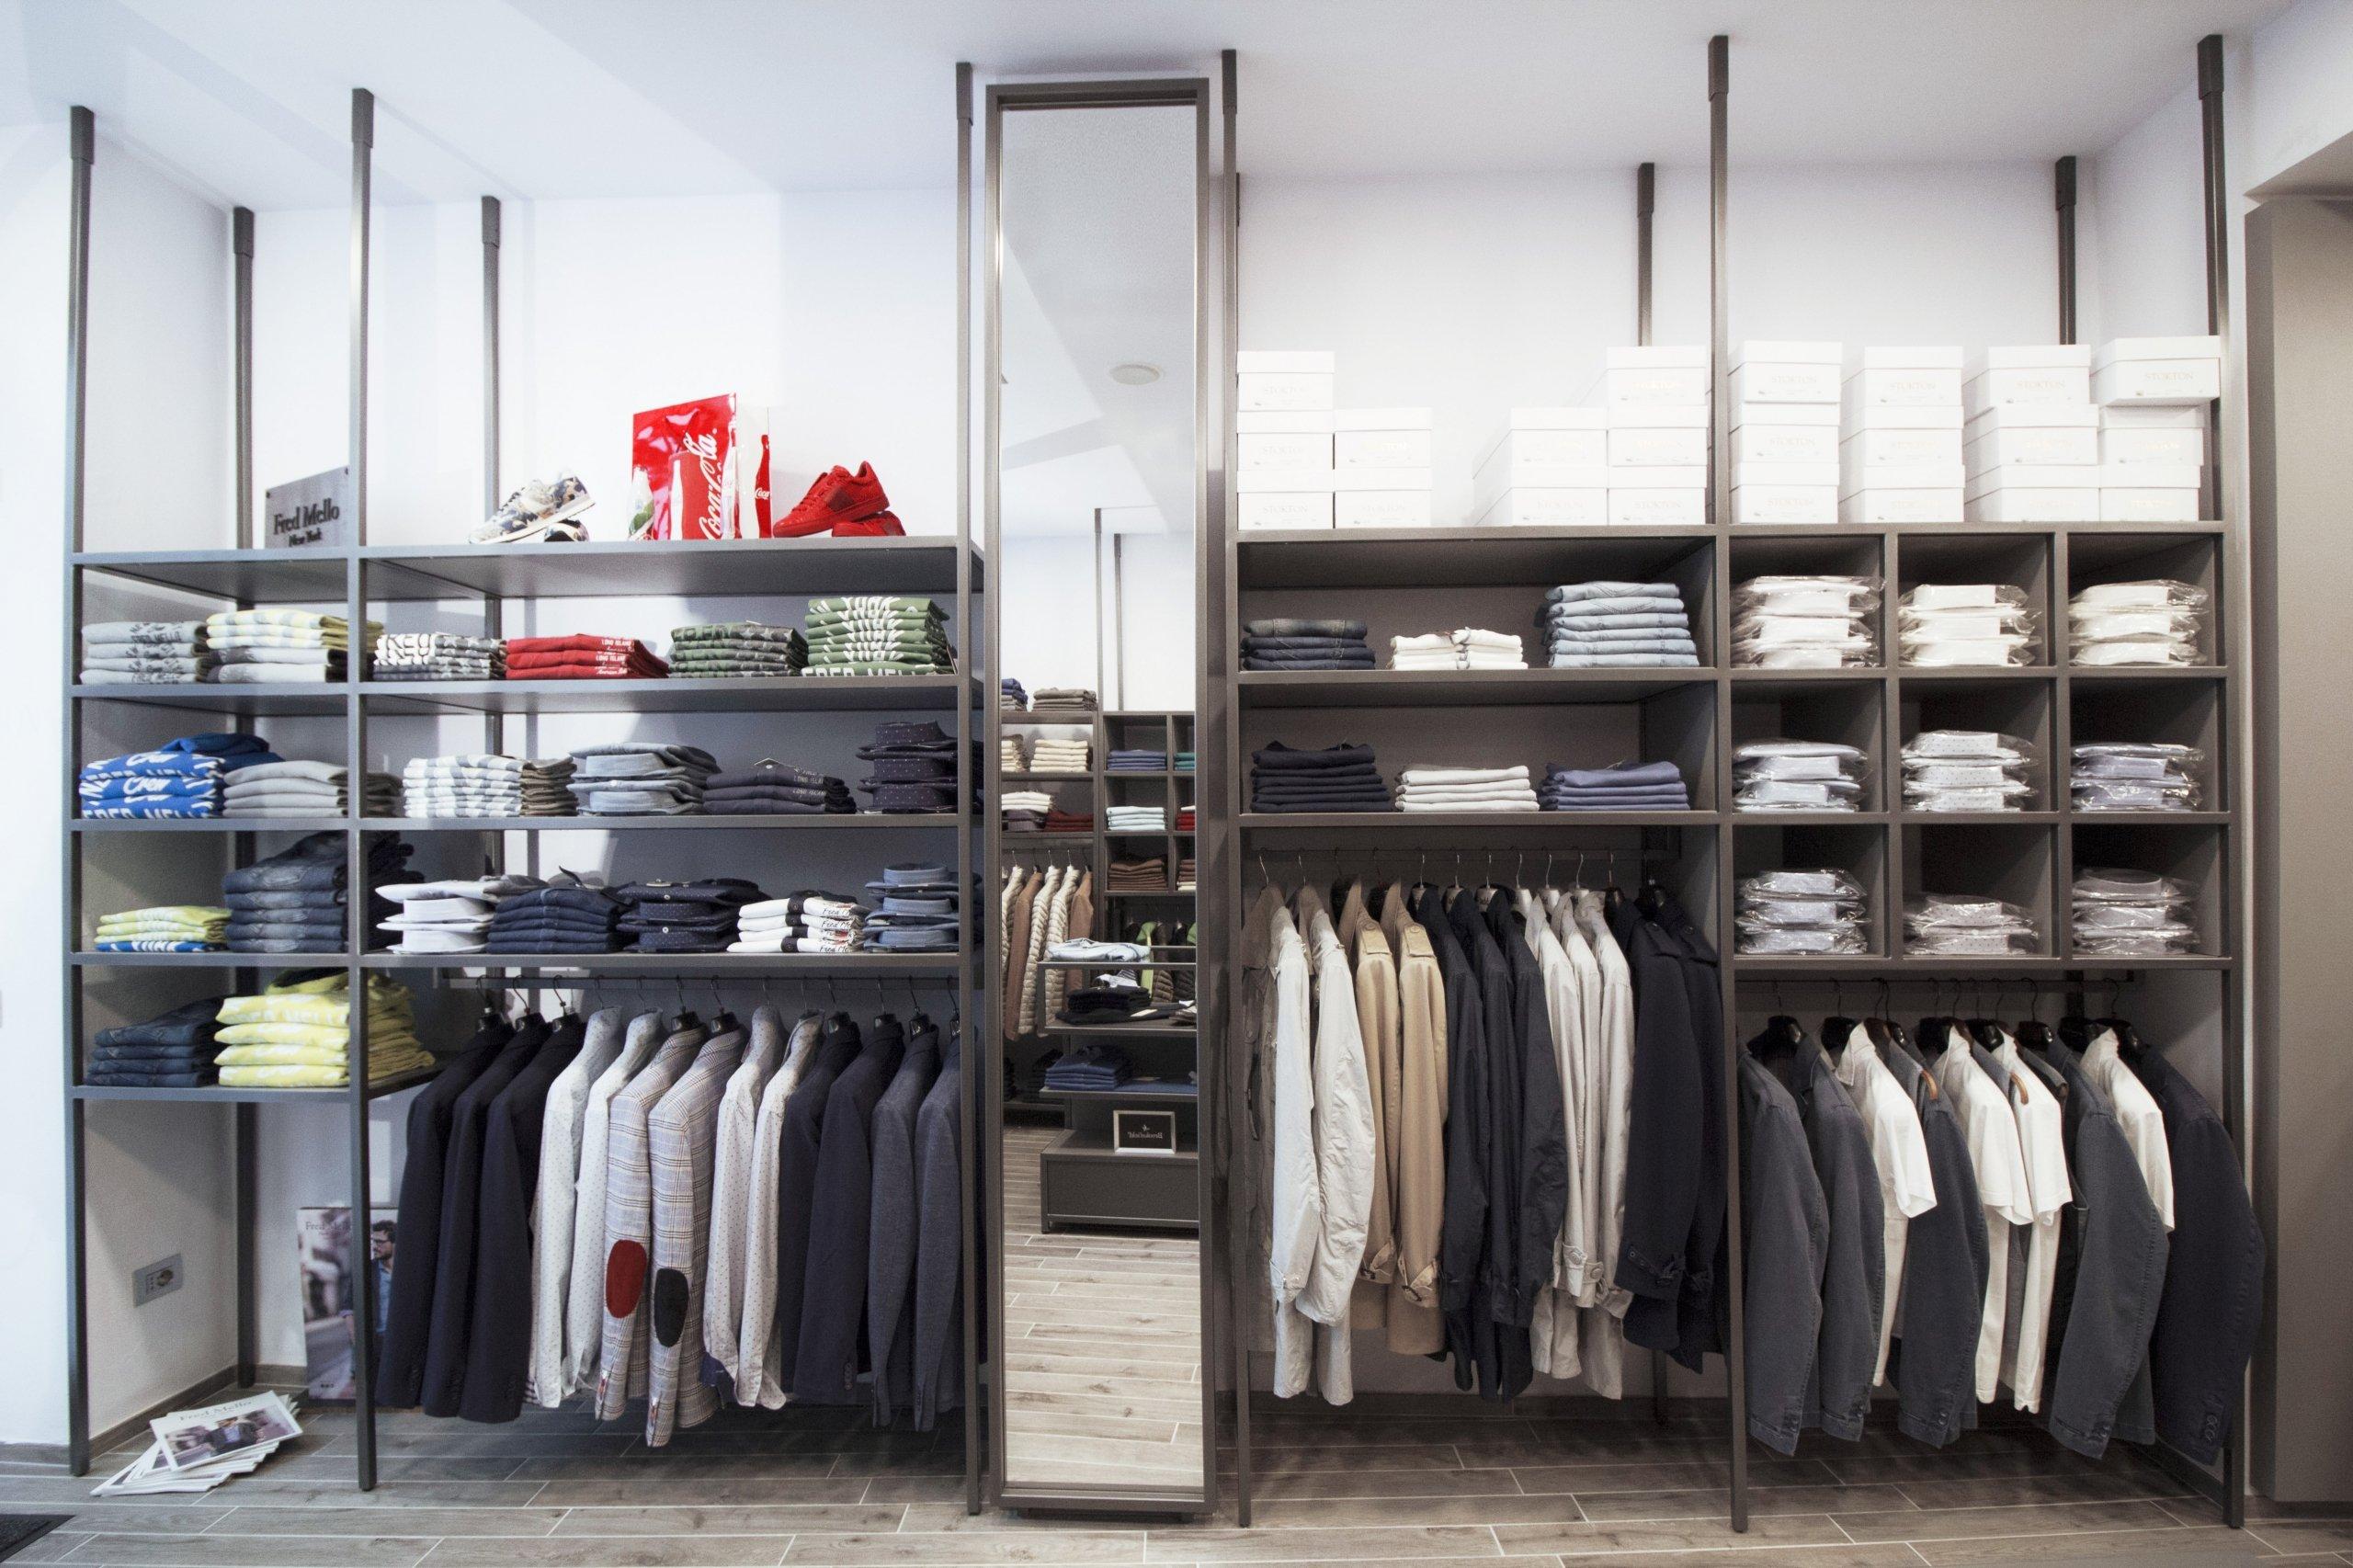 LSC-allestimento-negozio-abbiategrasso-IMG_1478